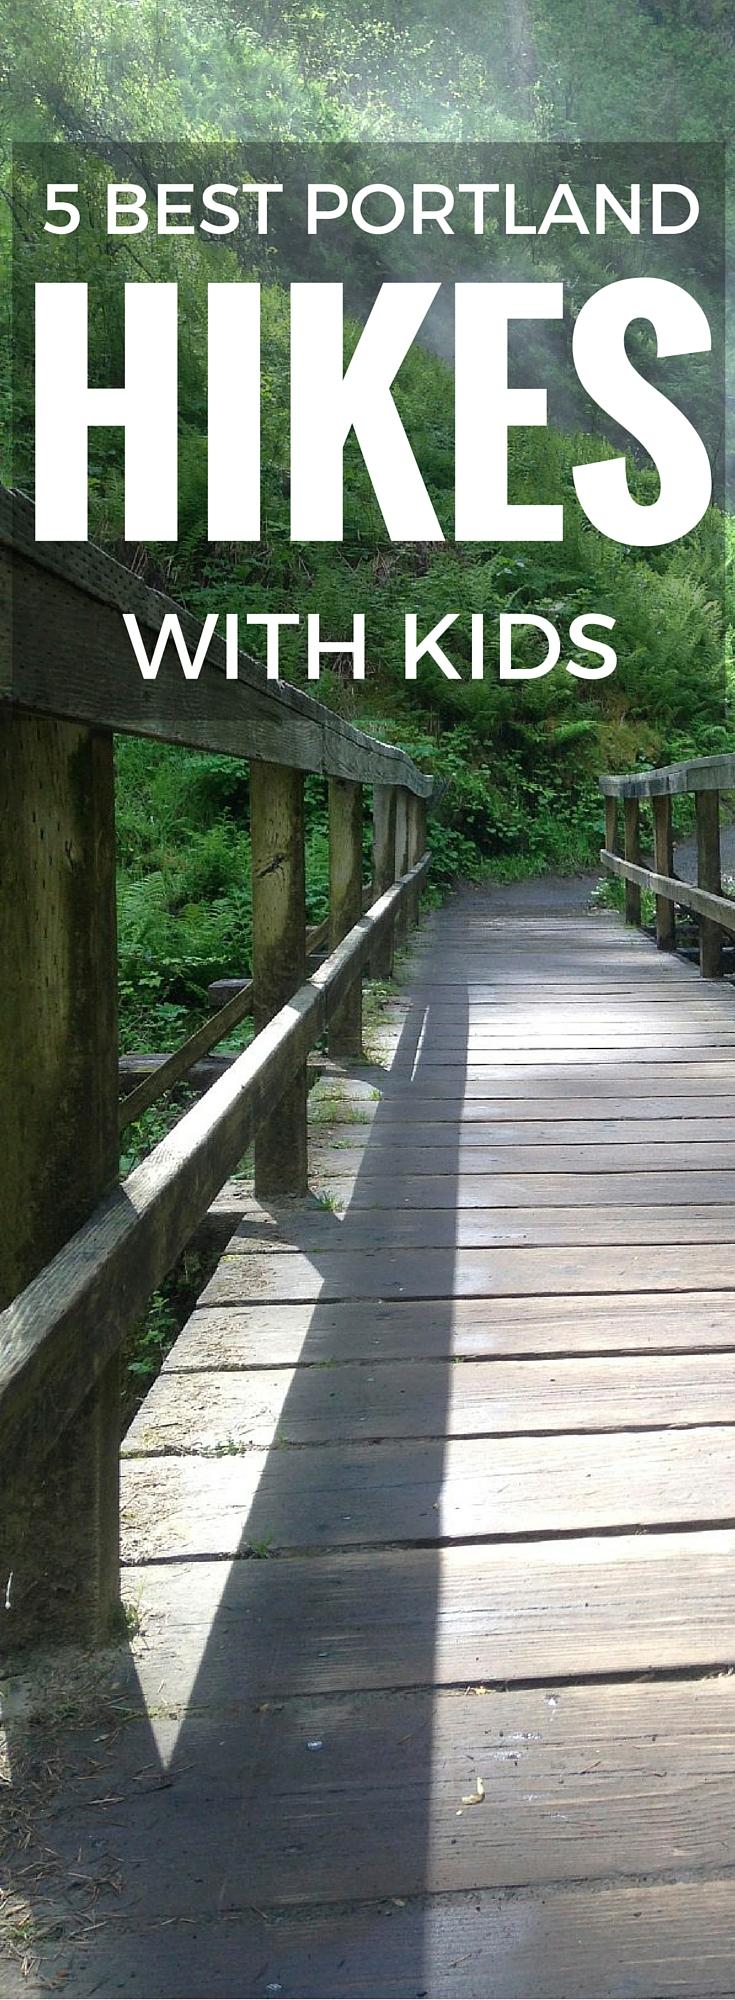 Portland-hikes-with-kids